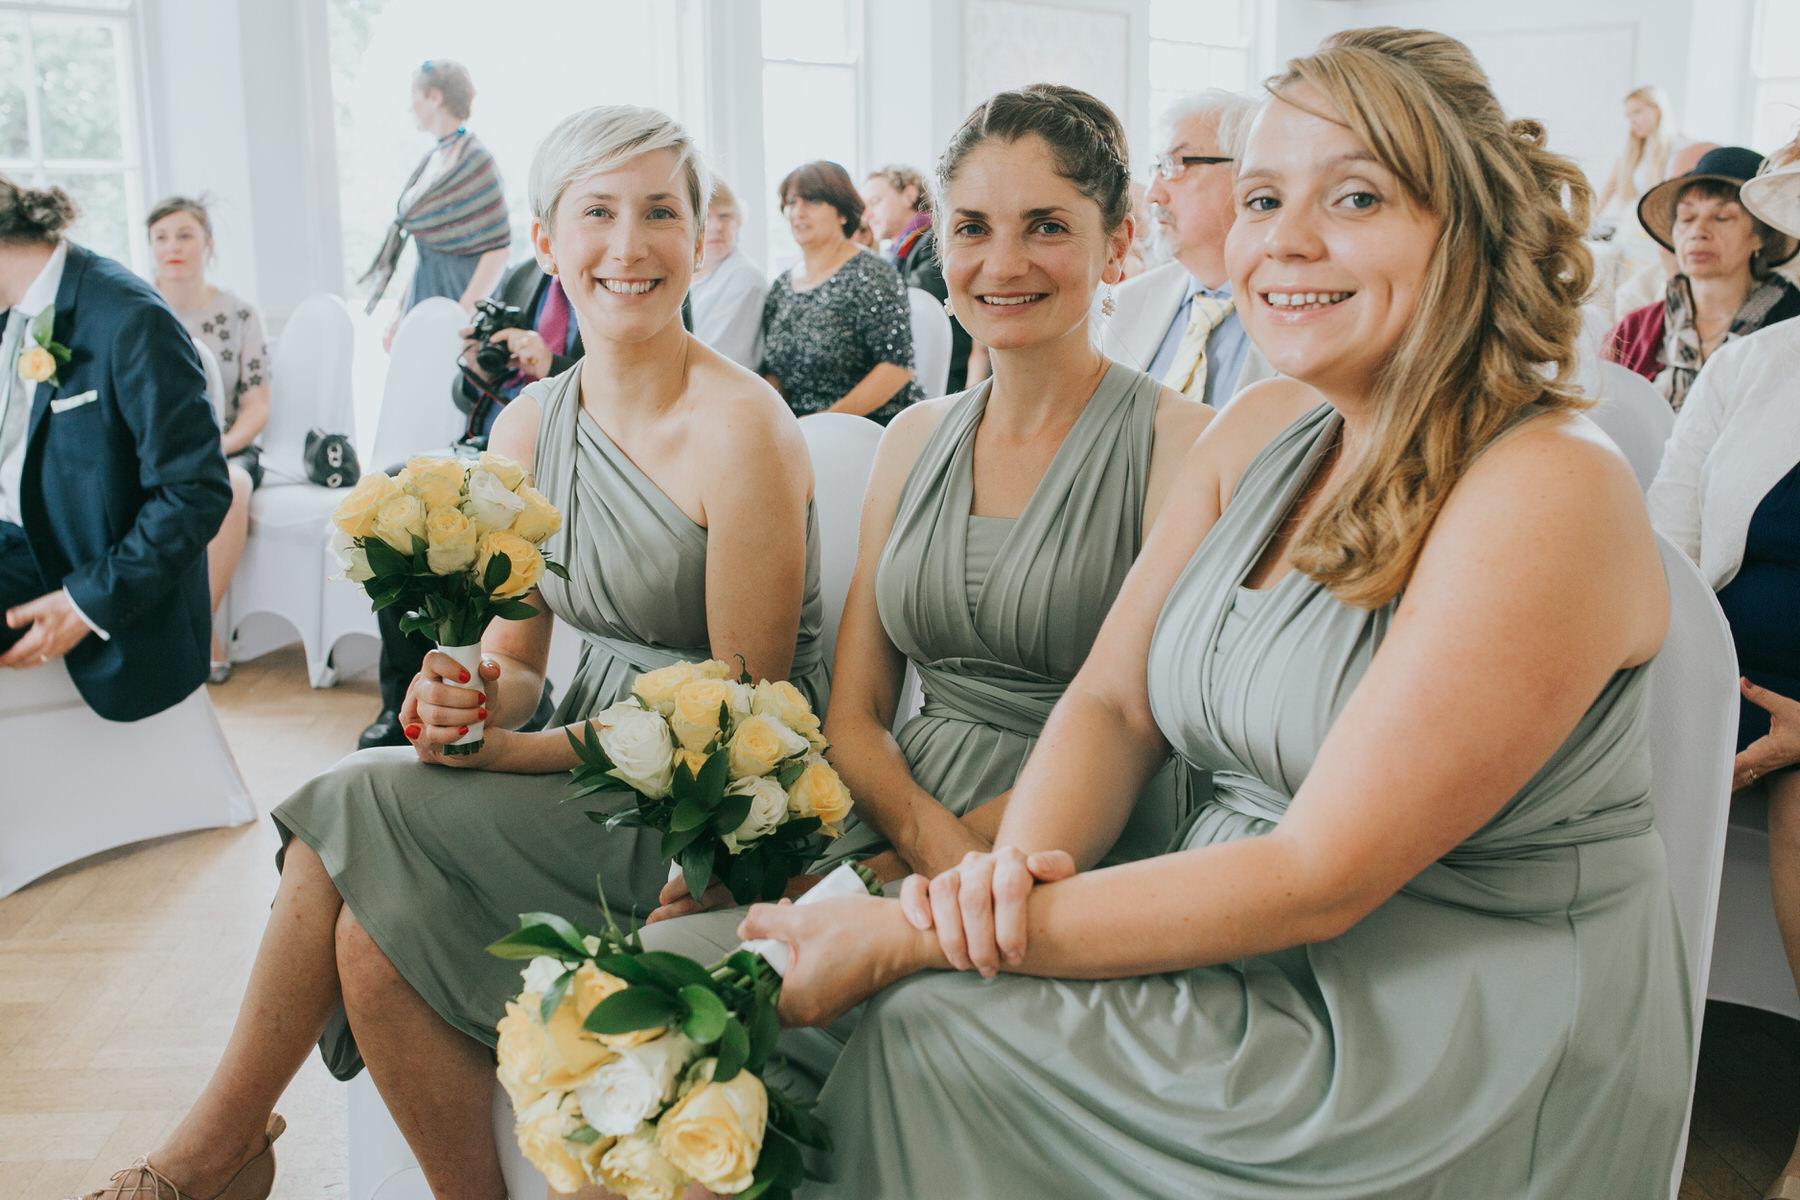 111 happy bridesmaids wearing mint dress yellow rose bouquets.jpg